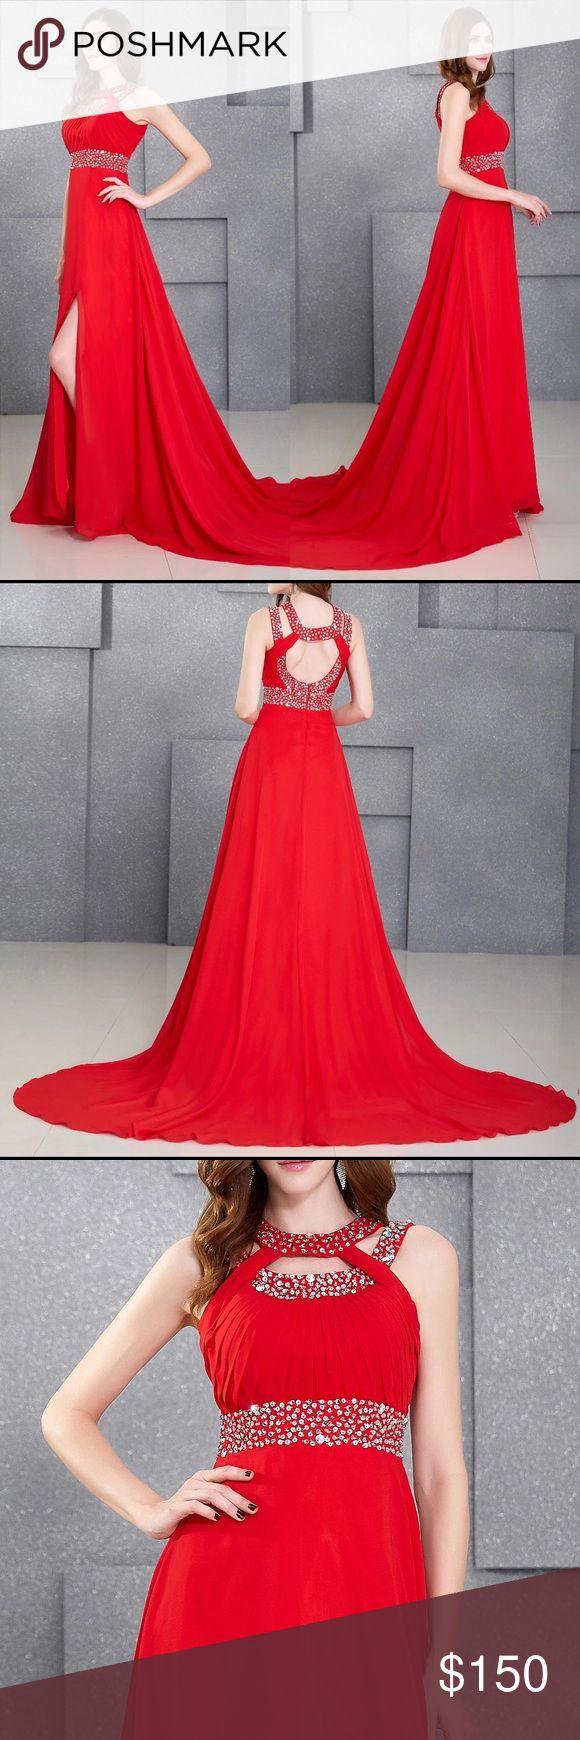 Crystal Beads Floor Length Red Dress Crystal beads floor Length red prom evening dress. Dresses Prom